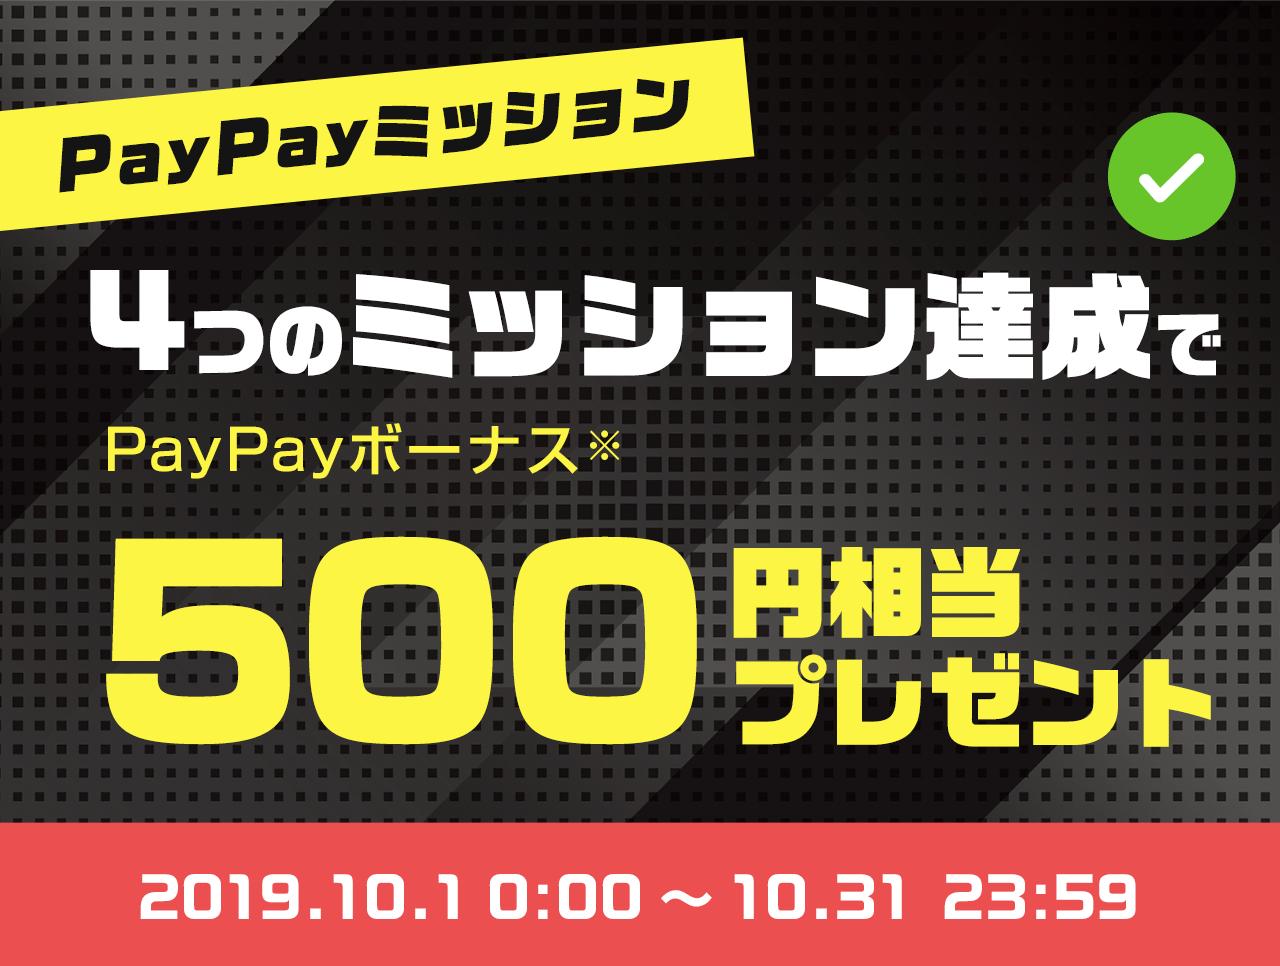 PayPayミッション 4つのミッション達成でPayPayボーナス500円相当プレゼント